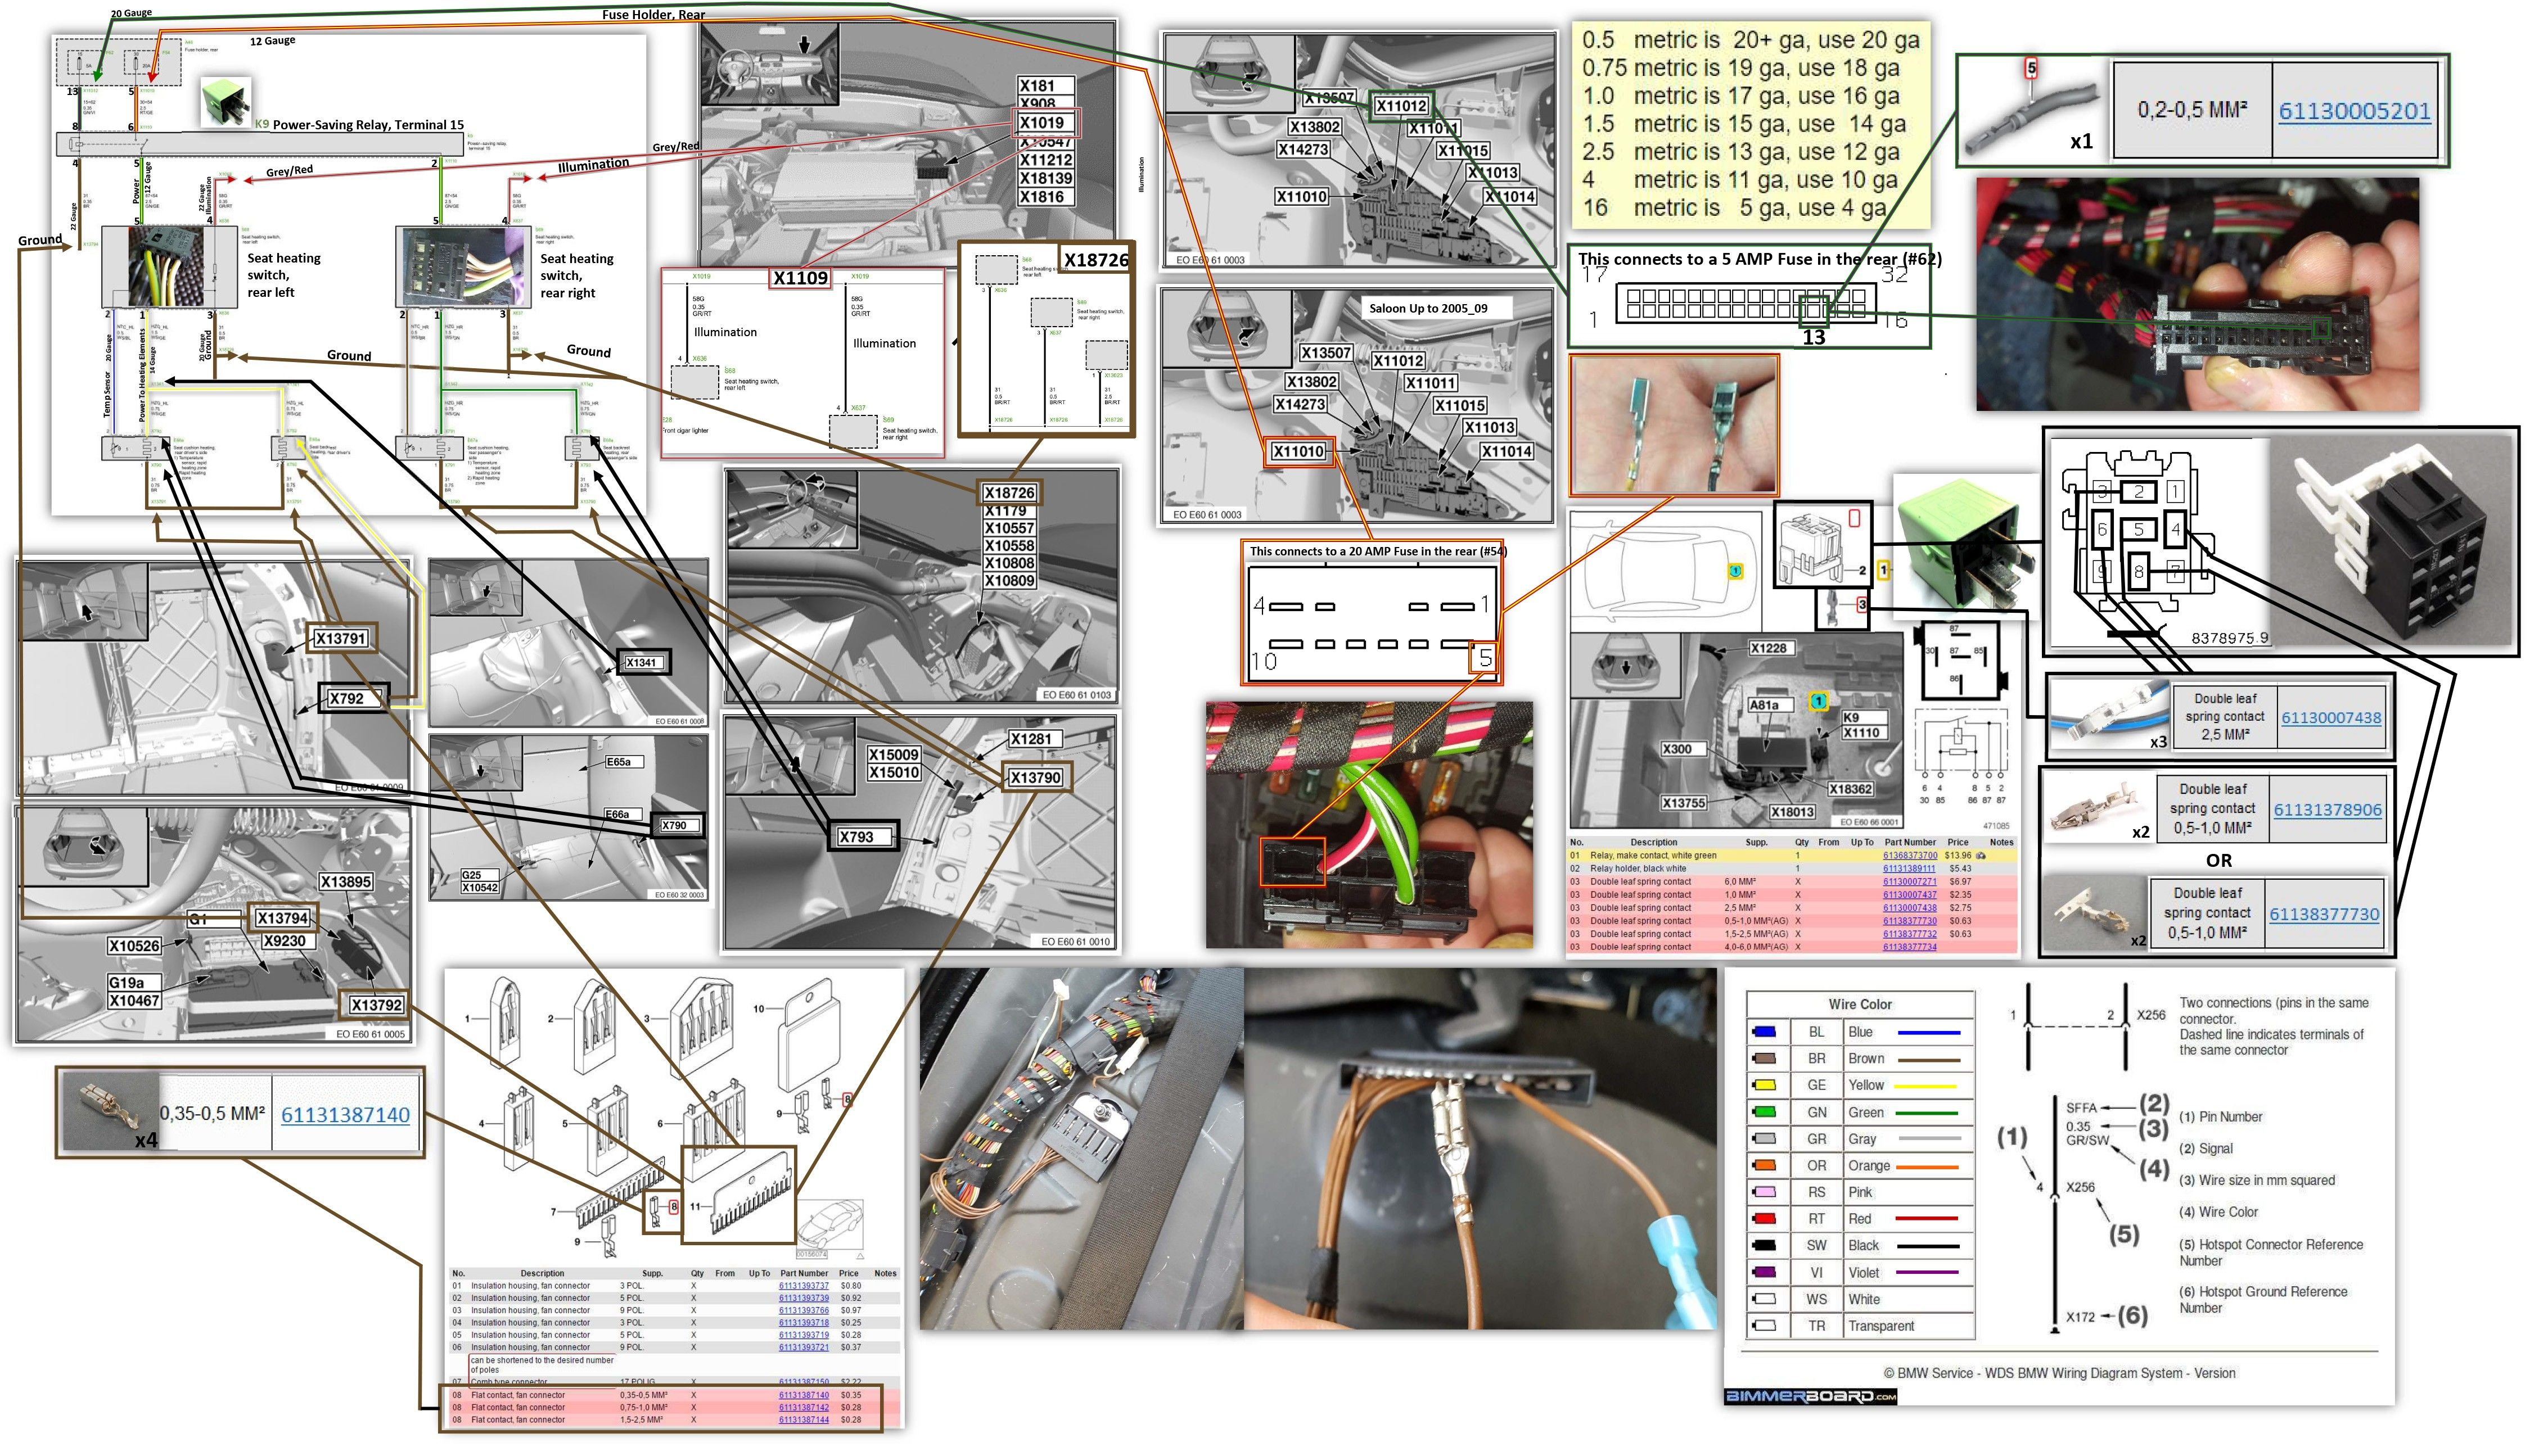 Unique Bmw E46 Heated Seat Wiring Diagram #diagram #diagramtemplate  #diagramsample Check more at https://servisi.co/bmw-e46-heated-seat-wiring- diagram/ | Bmw Heated Seat Wiring Diagram |  | Pinterest